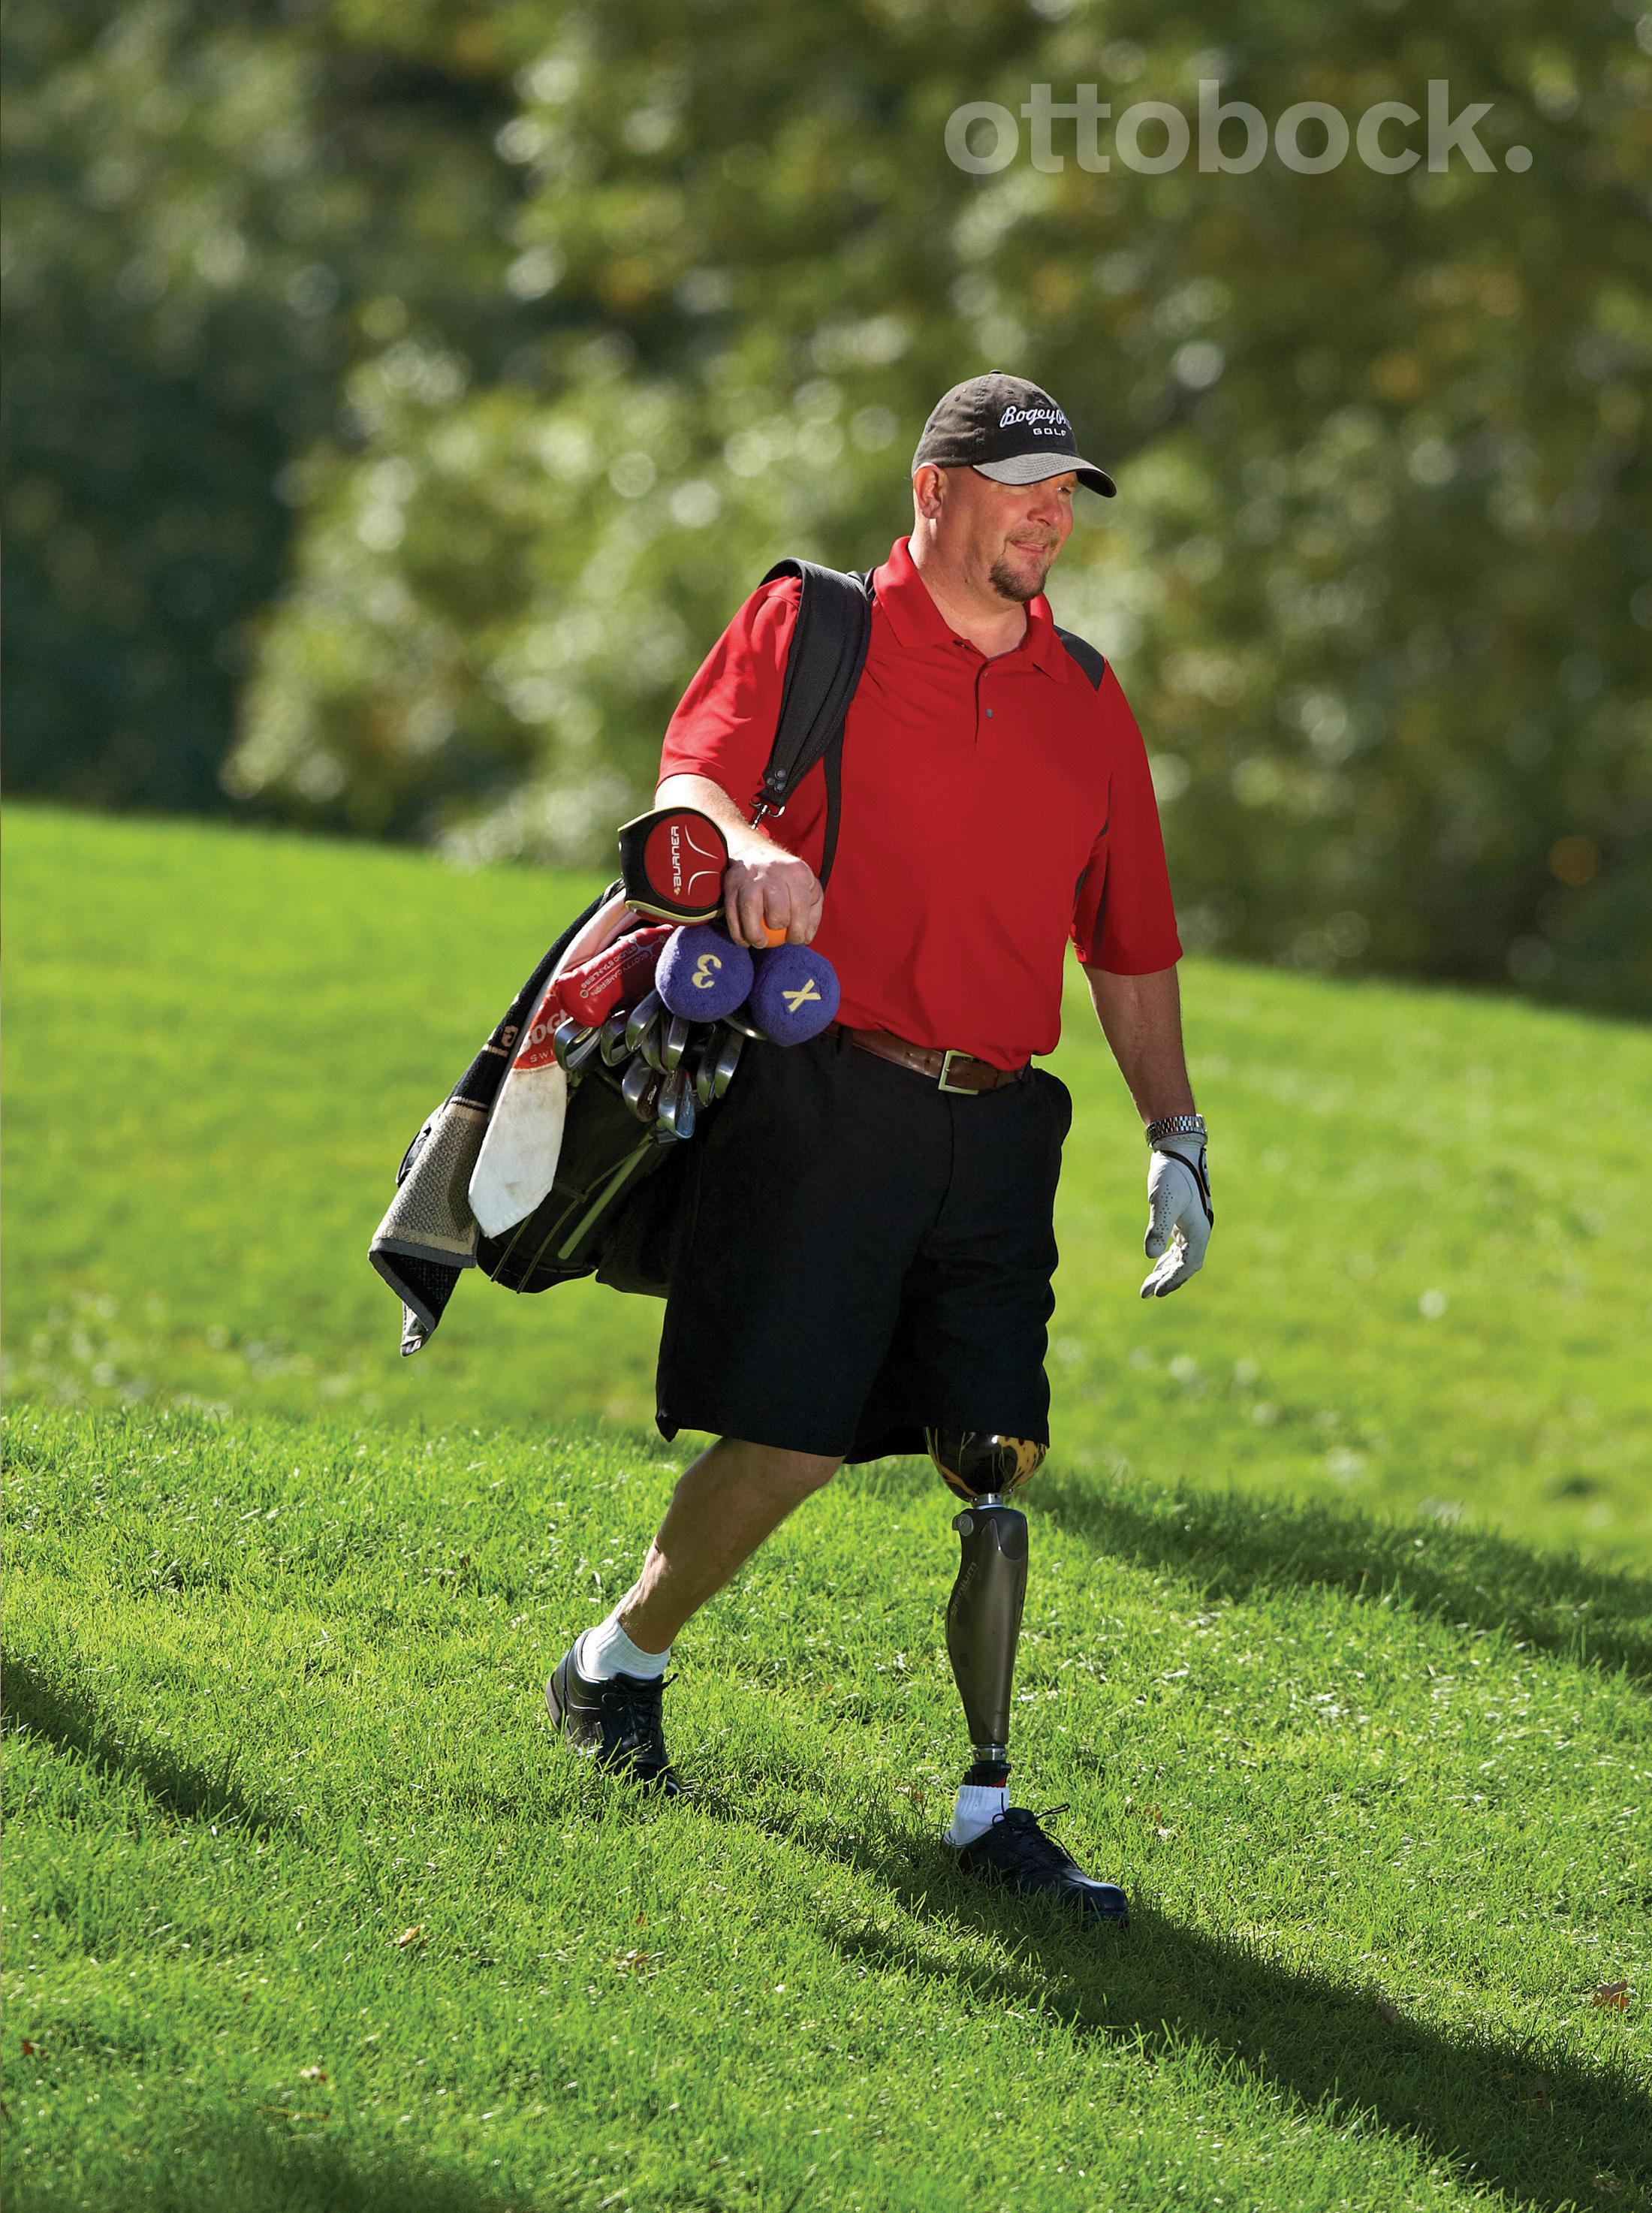 Ottobock C-Leg knee